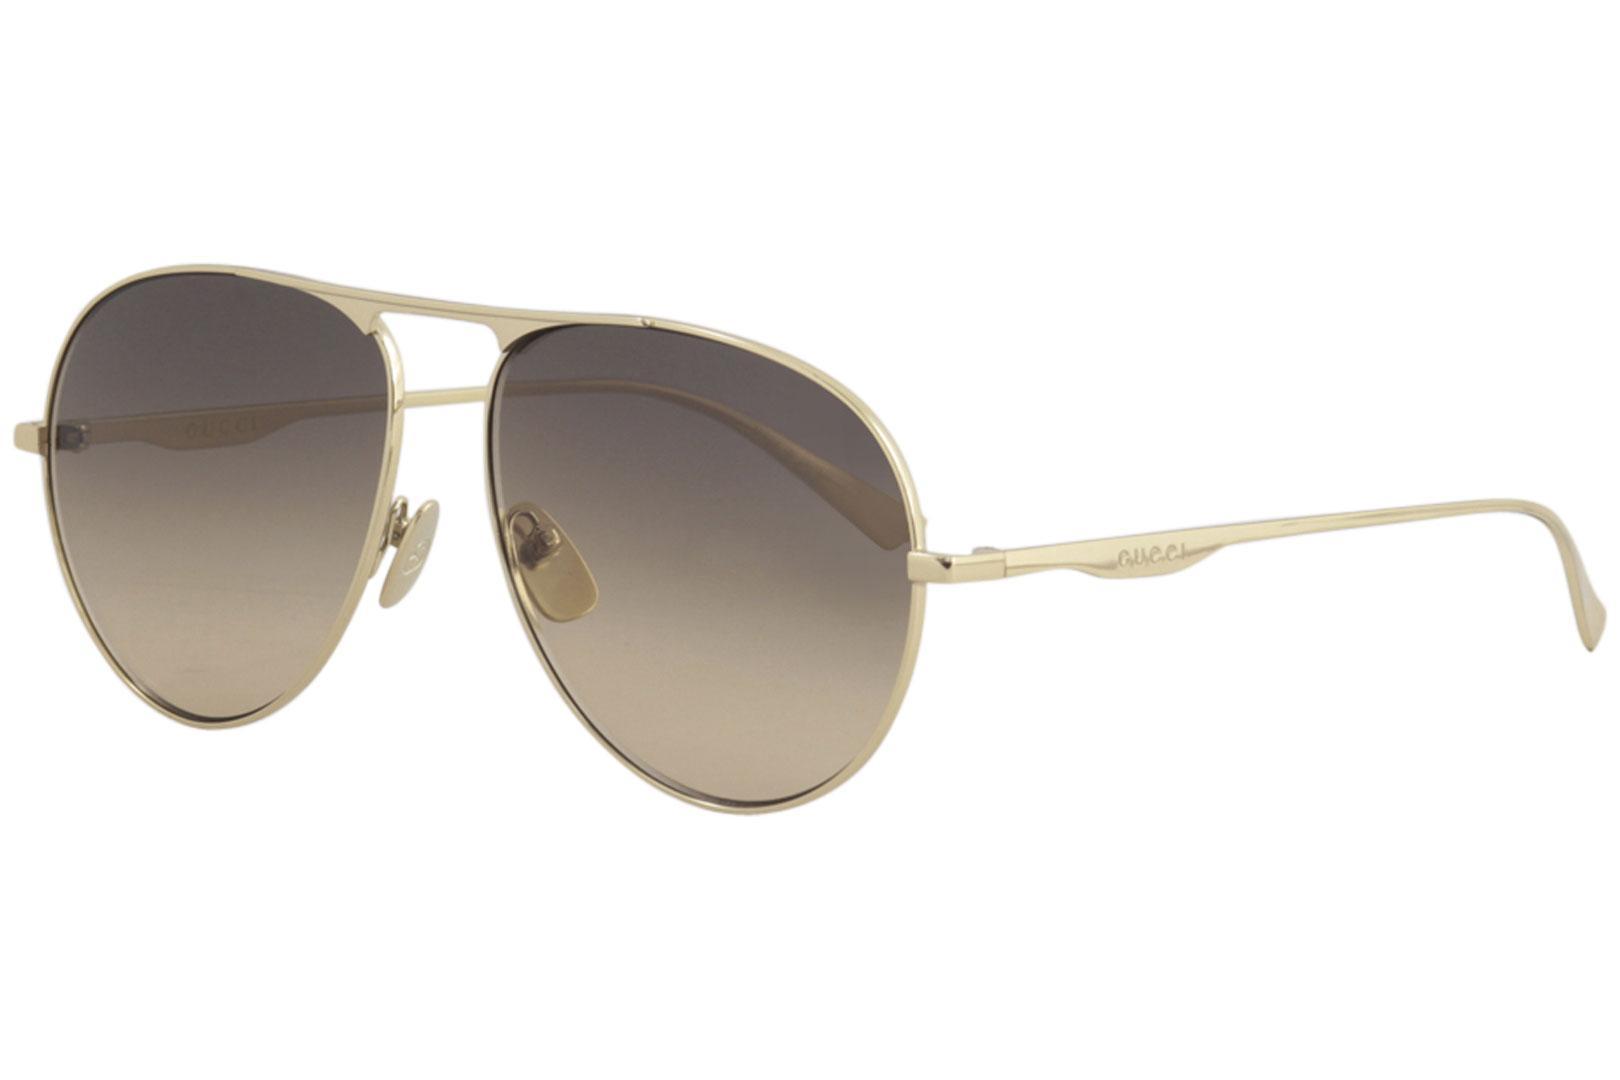 075ab5cfba9 Gucci Men s Urban GG0334S GG 0334 S Fashion Pilot Sunglasses